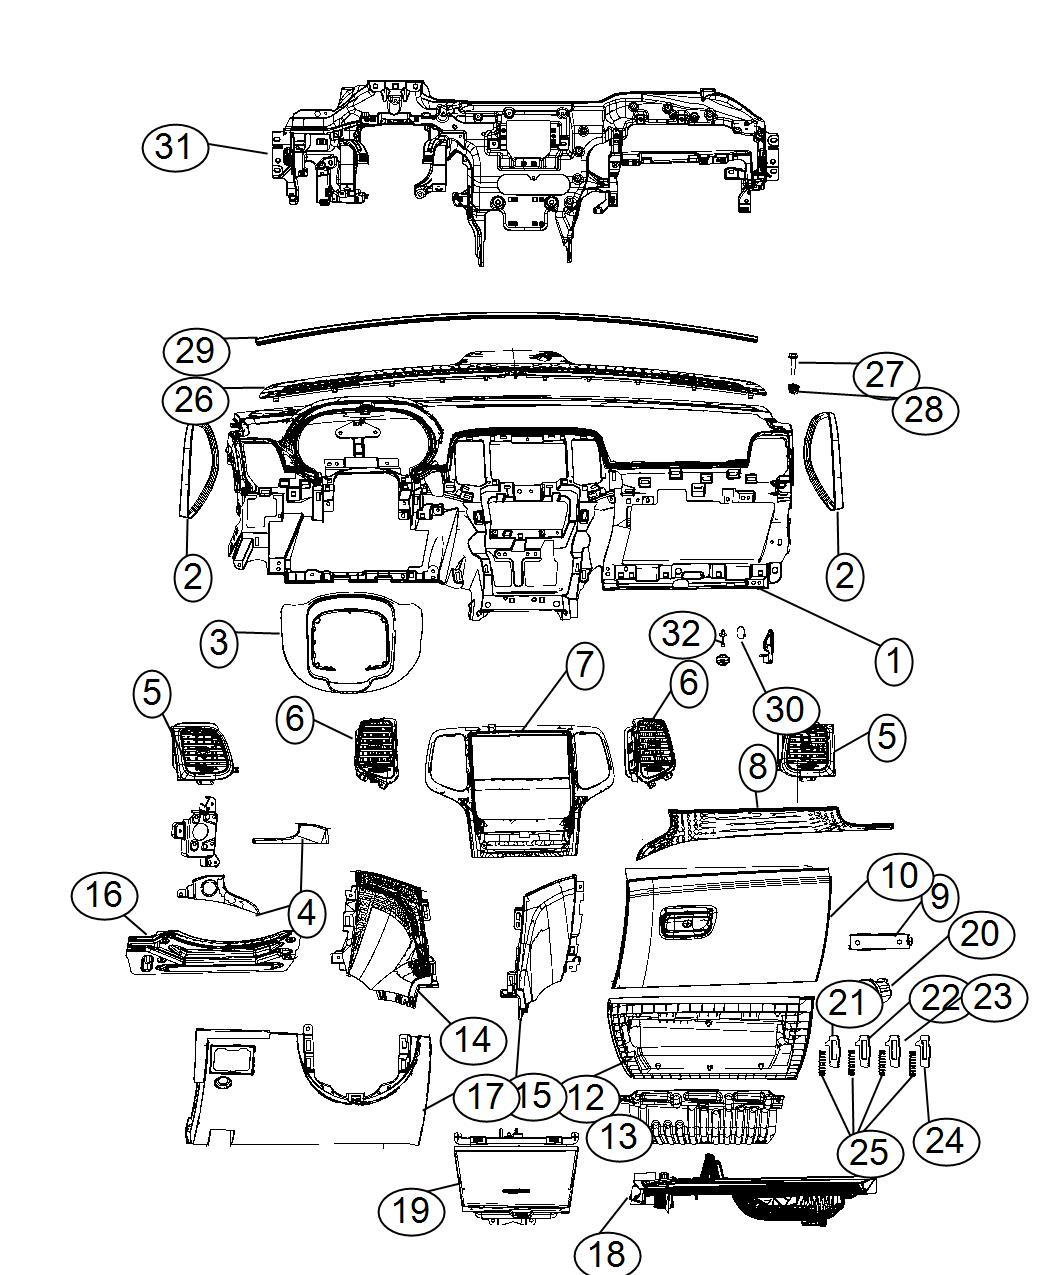 2017 Jeep Grand Cherokee Instrument panel. Base panel